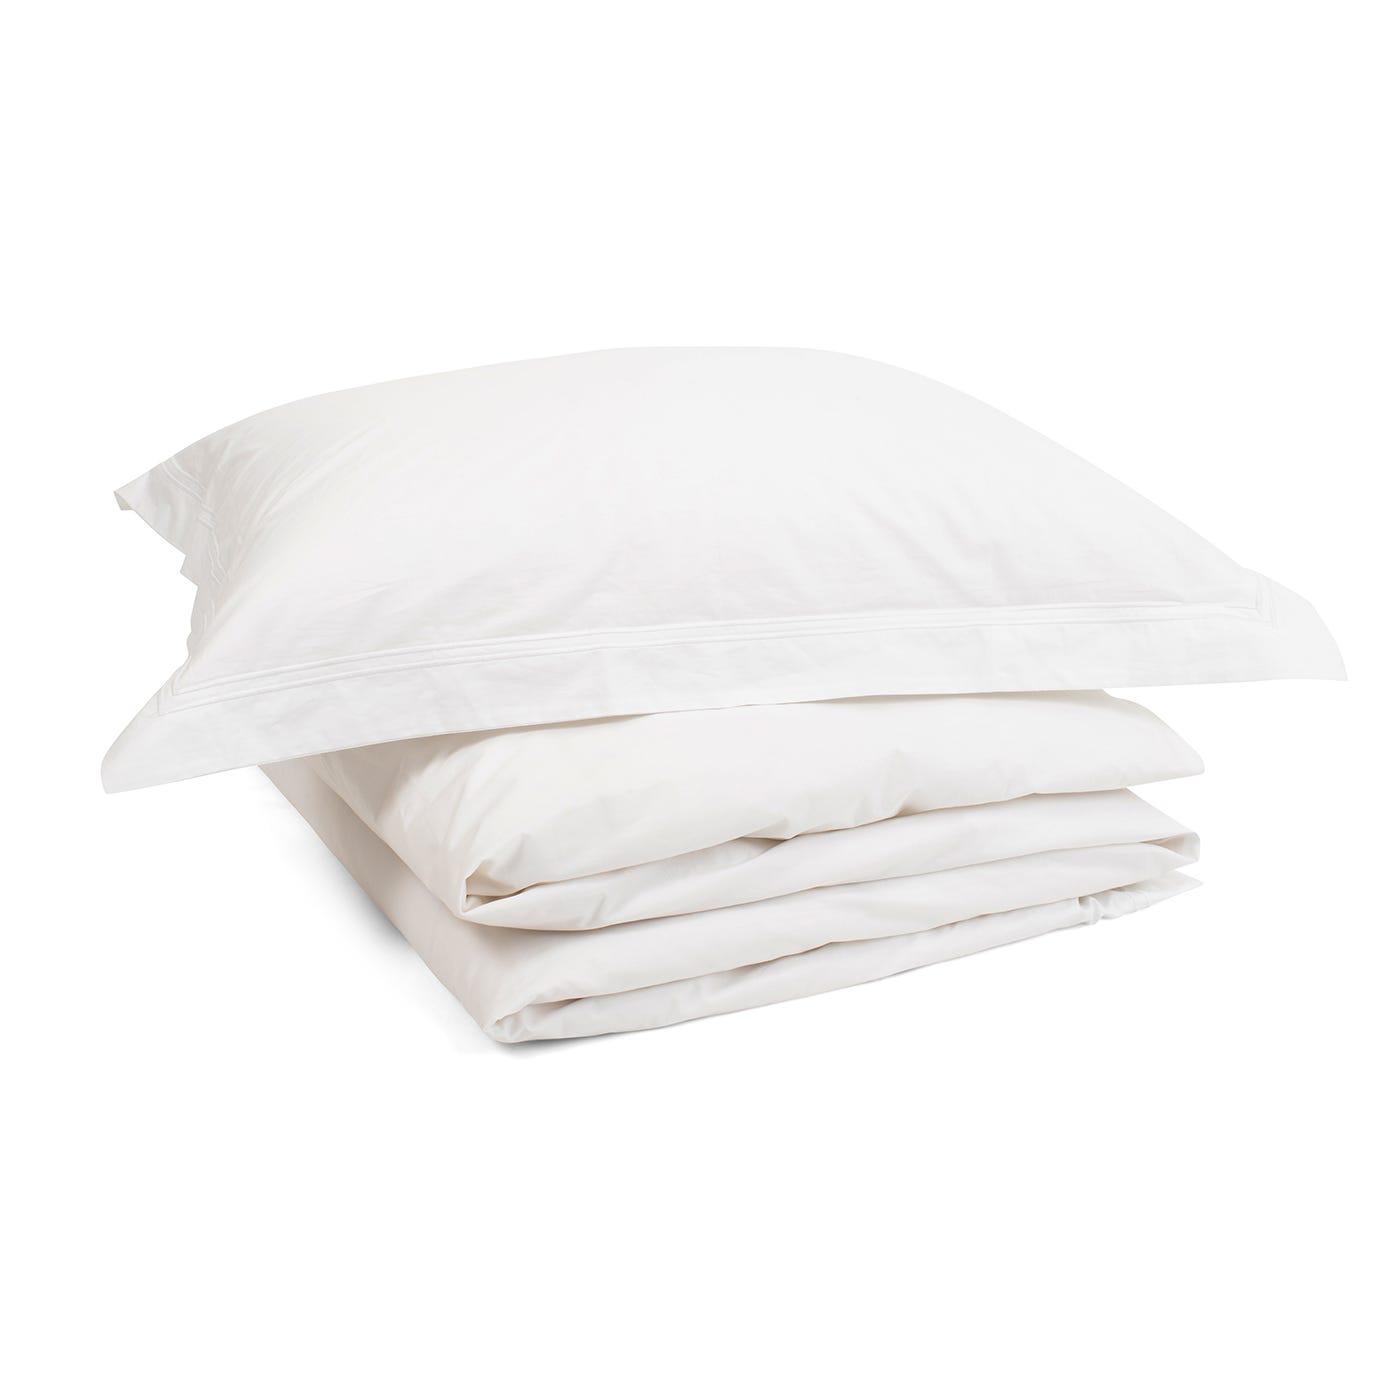 400 Thread Count Egyptian Cotton Double Duvet Cover